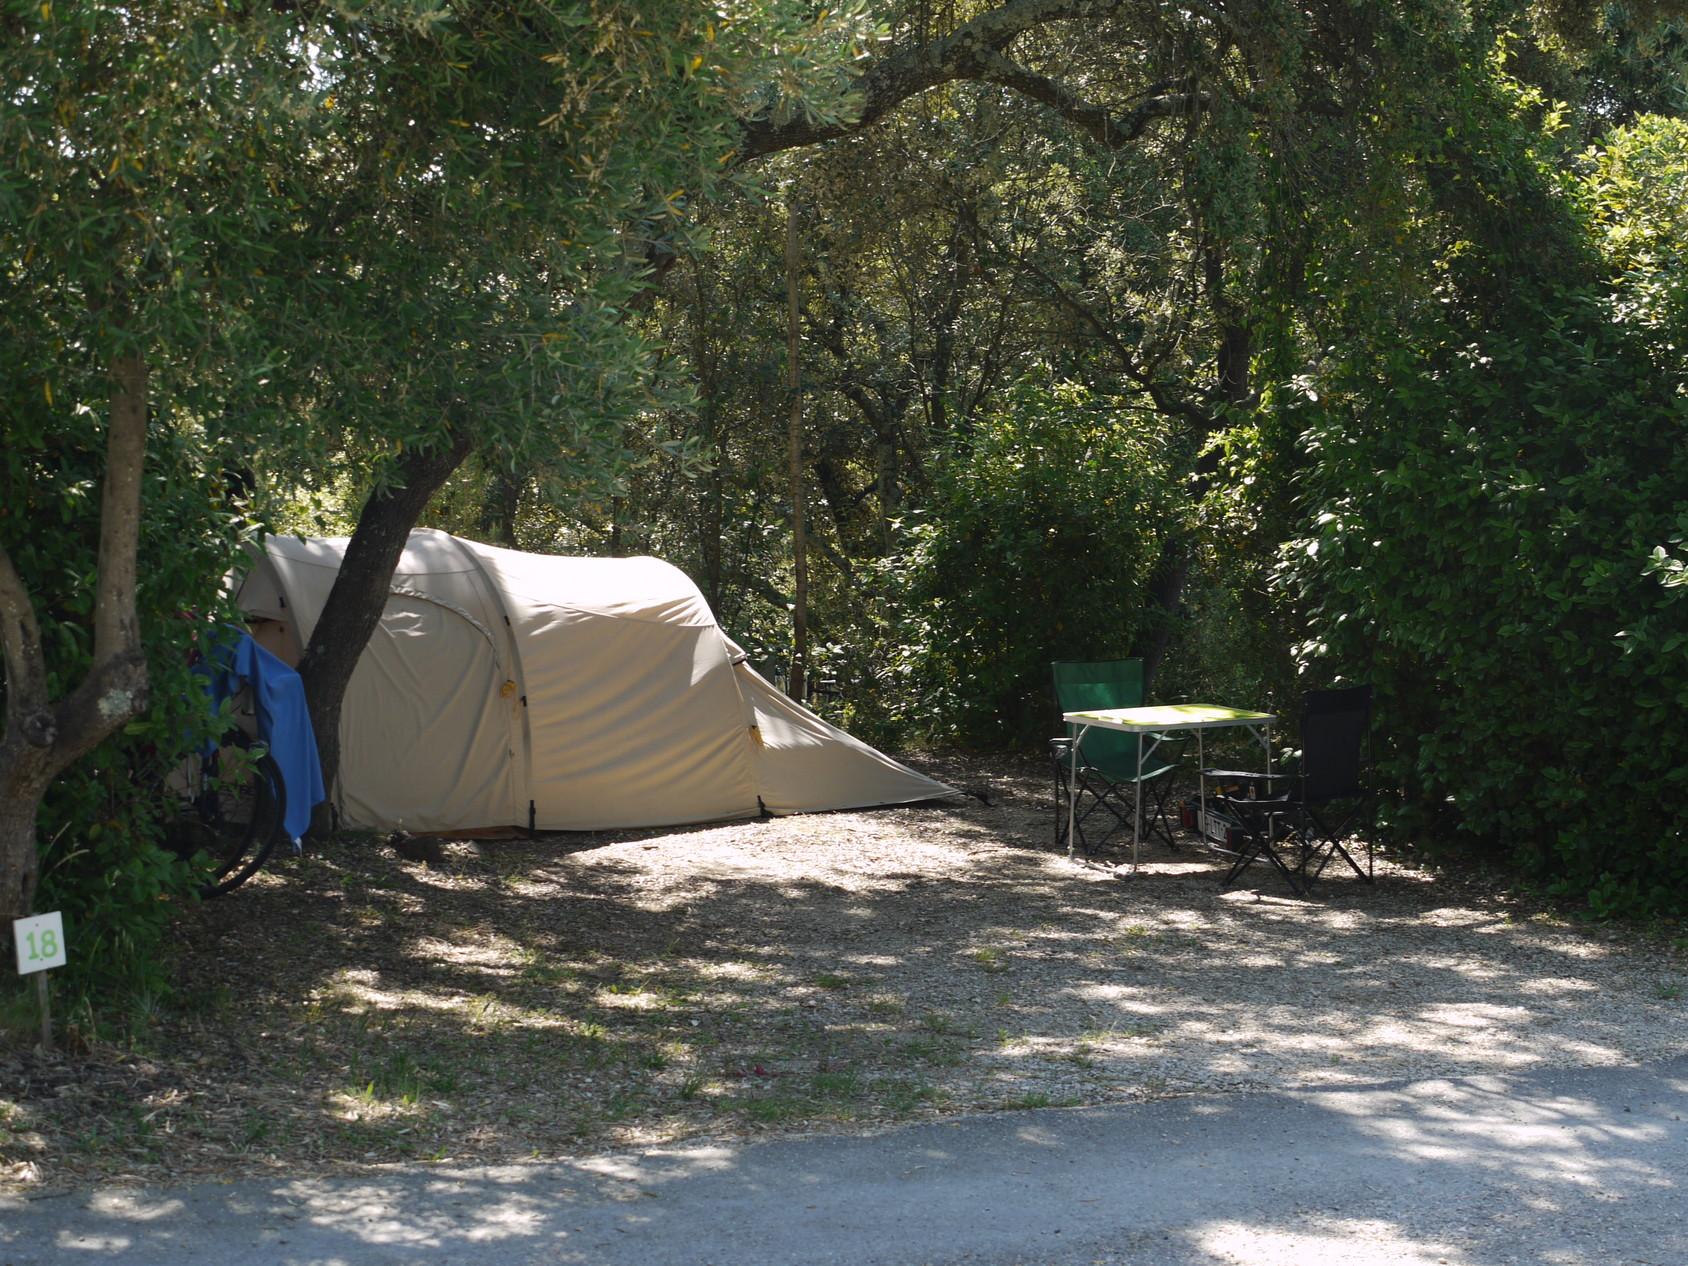 Frankrijk-Castries-Camping%20Le%20Fondespierre-ExtraLarge Wintersport Frankrijk